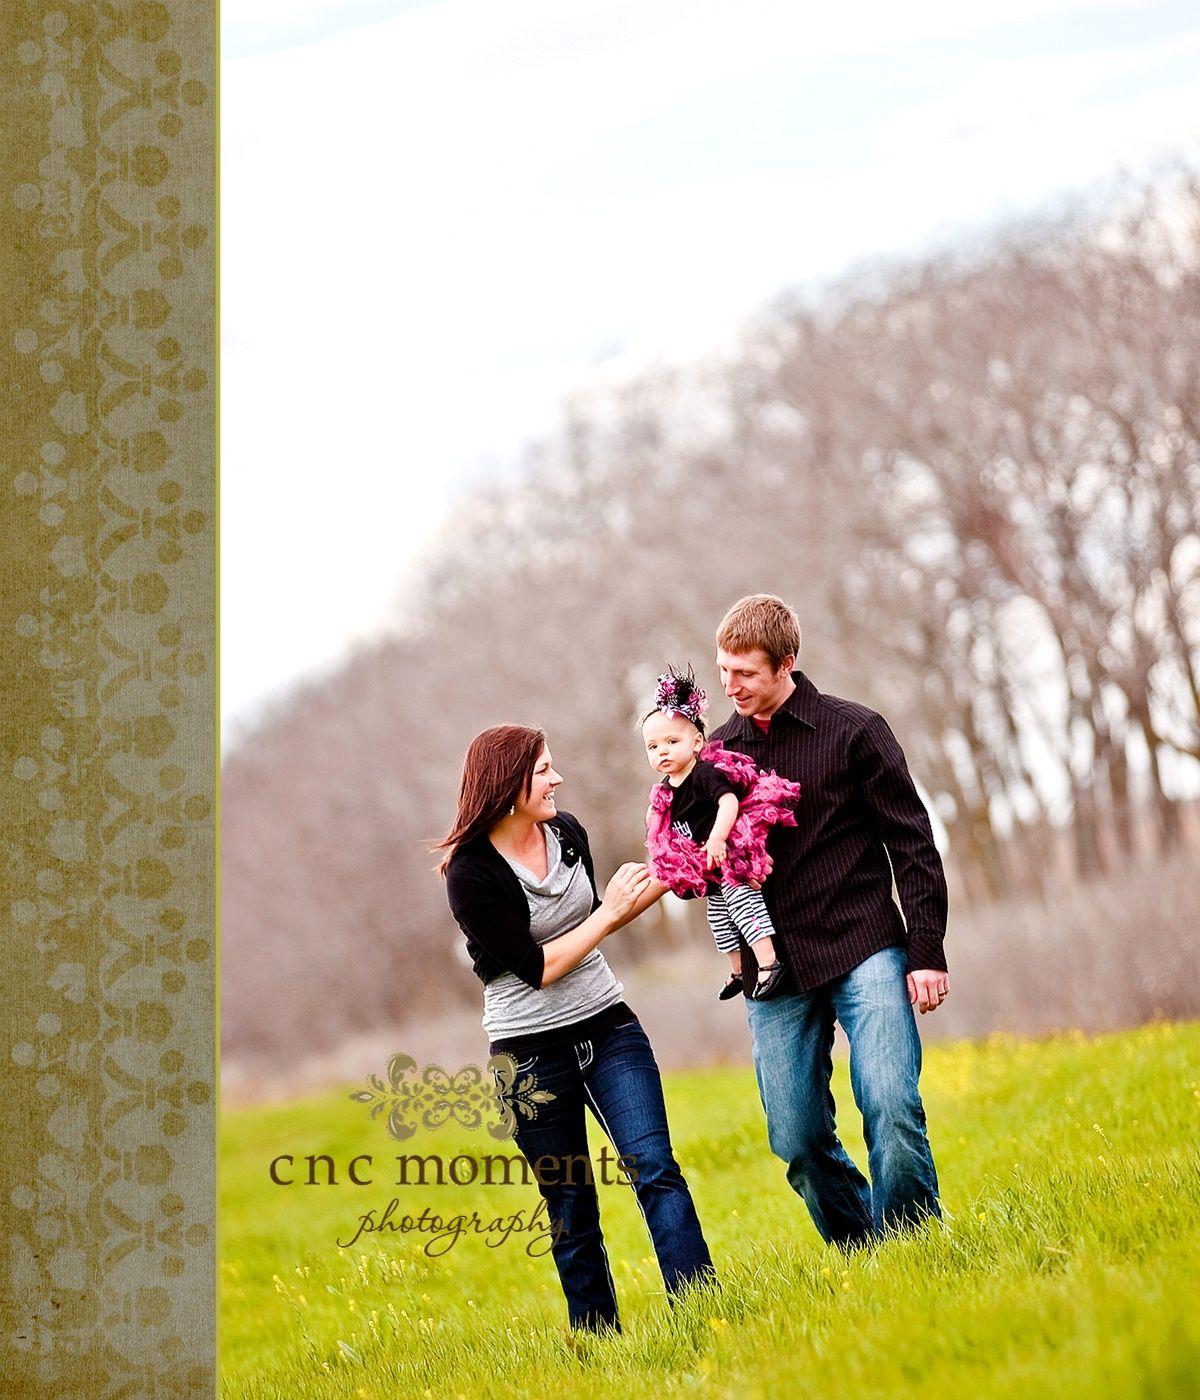 cnc moments photography plano nevada 1st birthday party 003